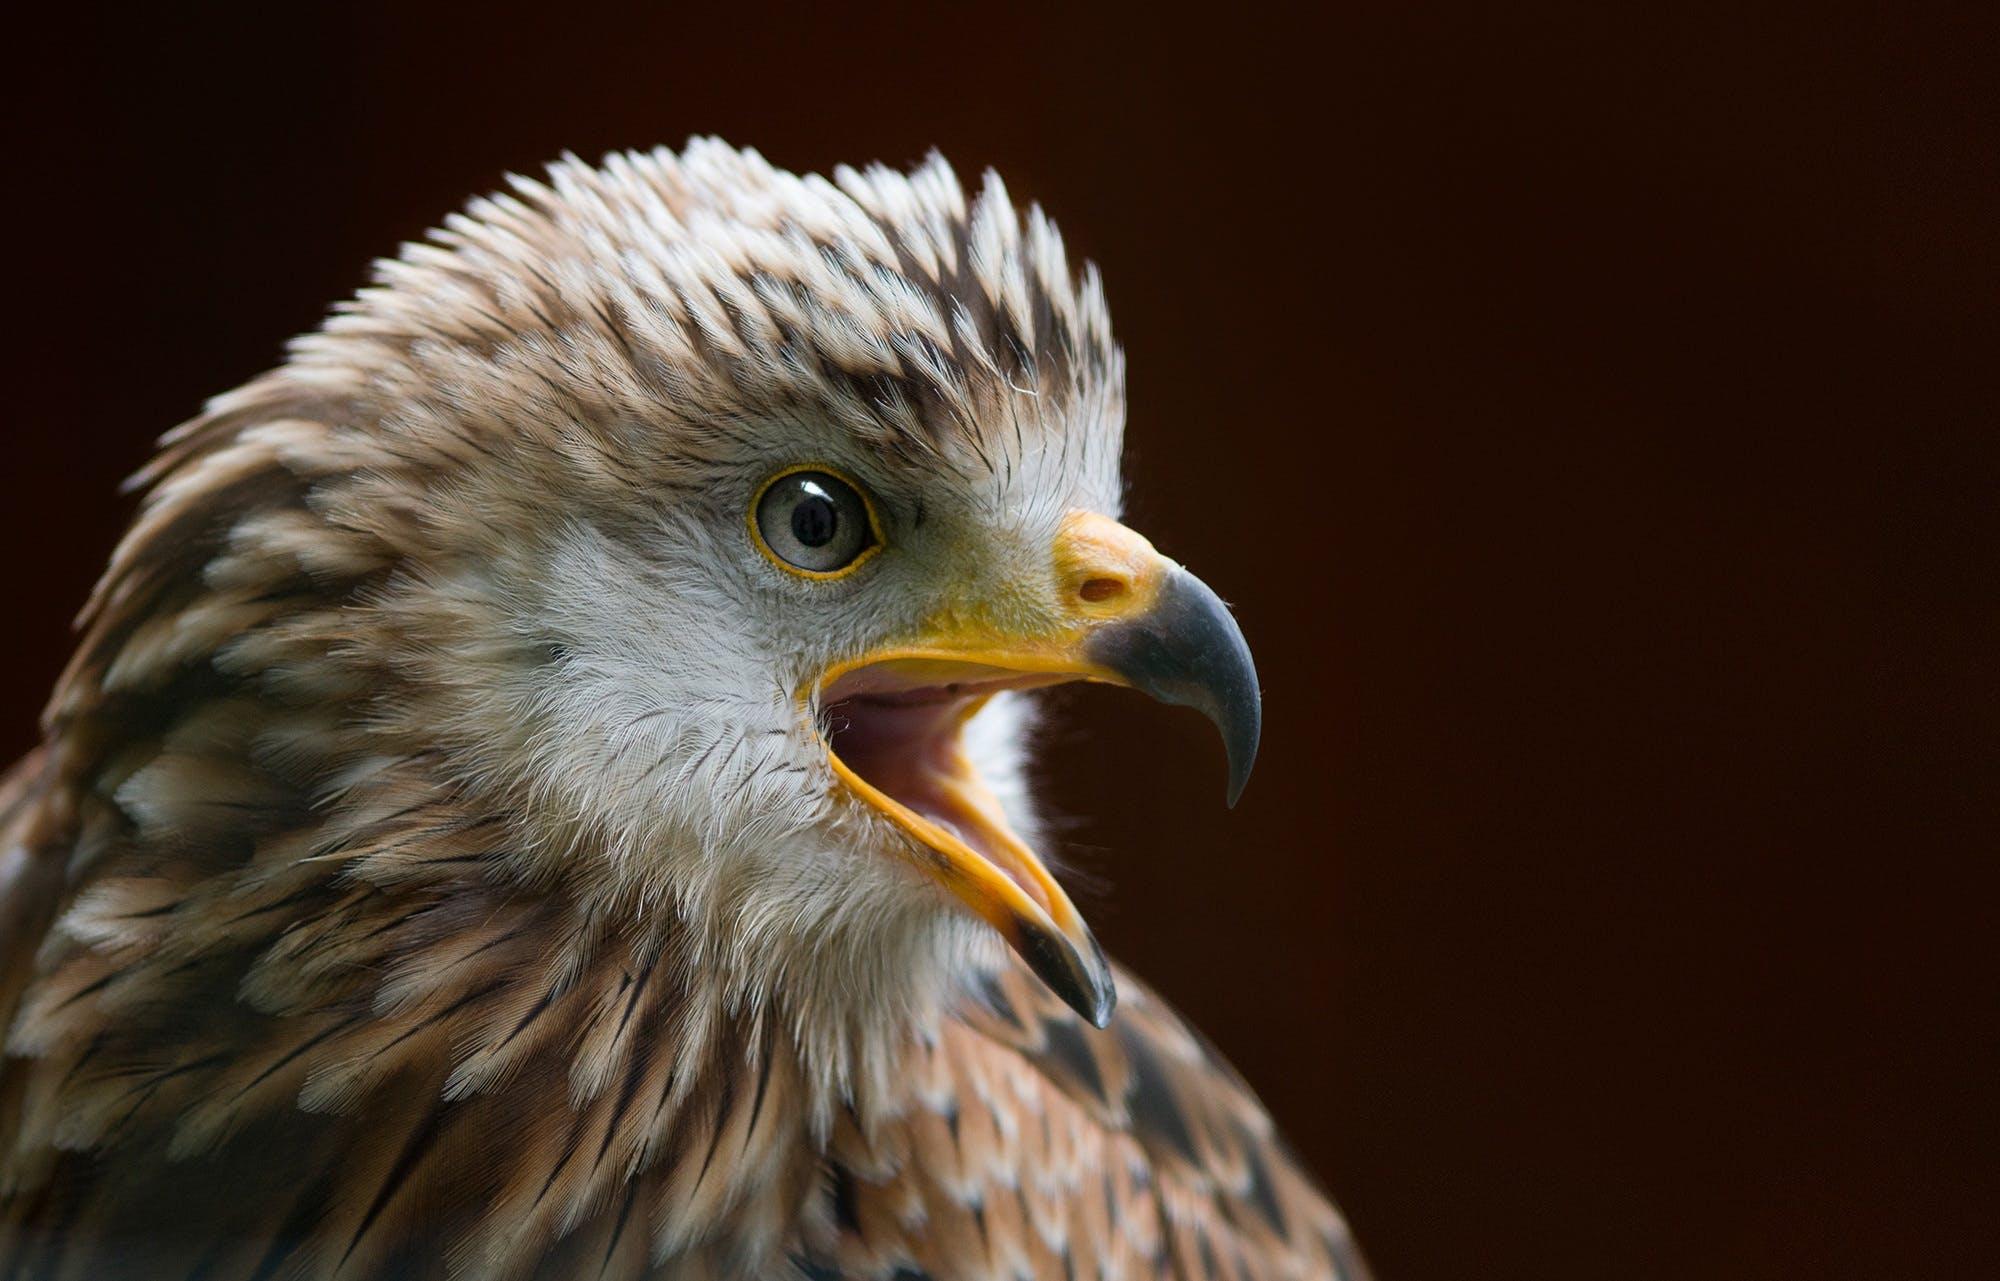 animal, animal world, avian